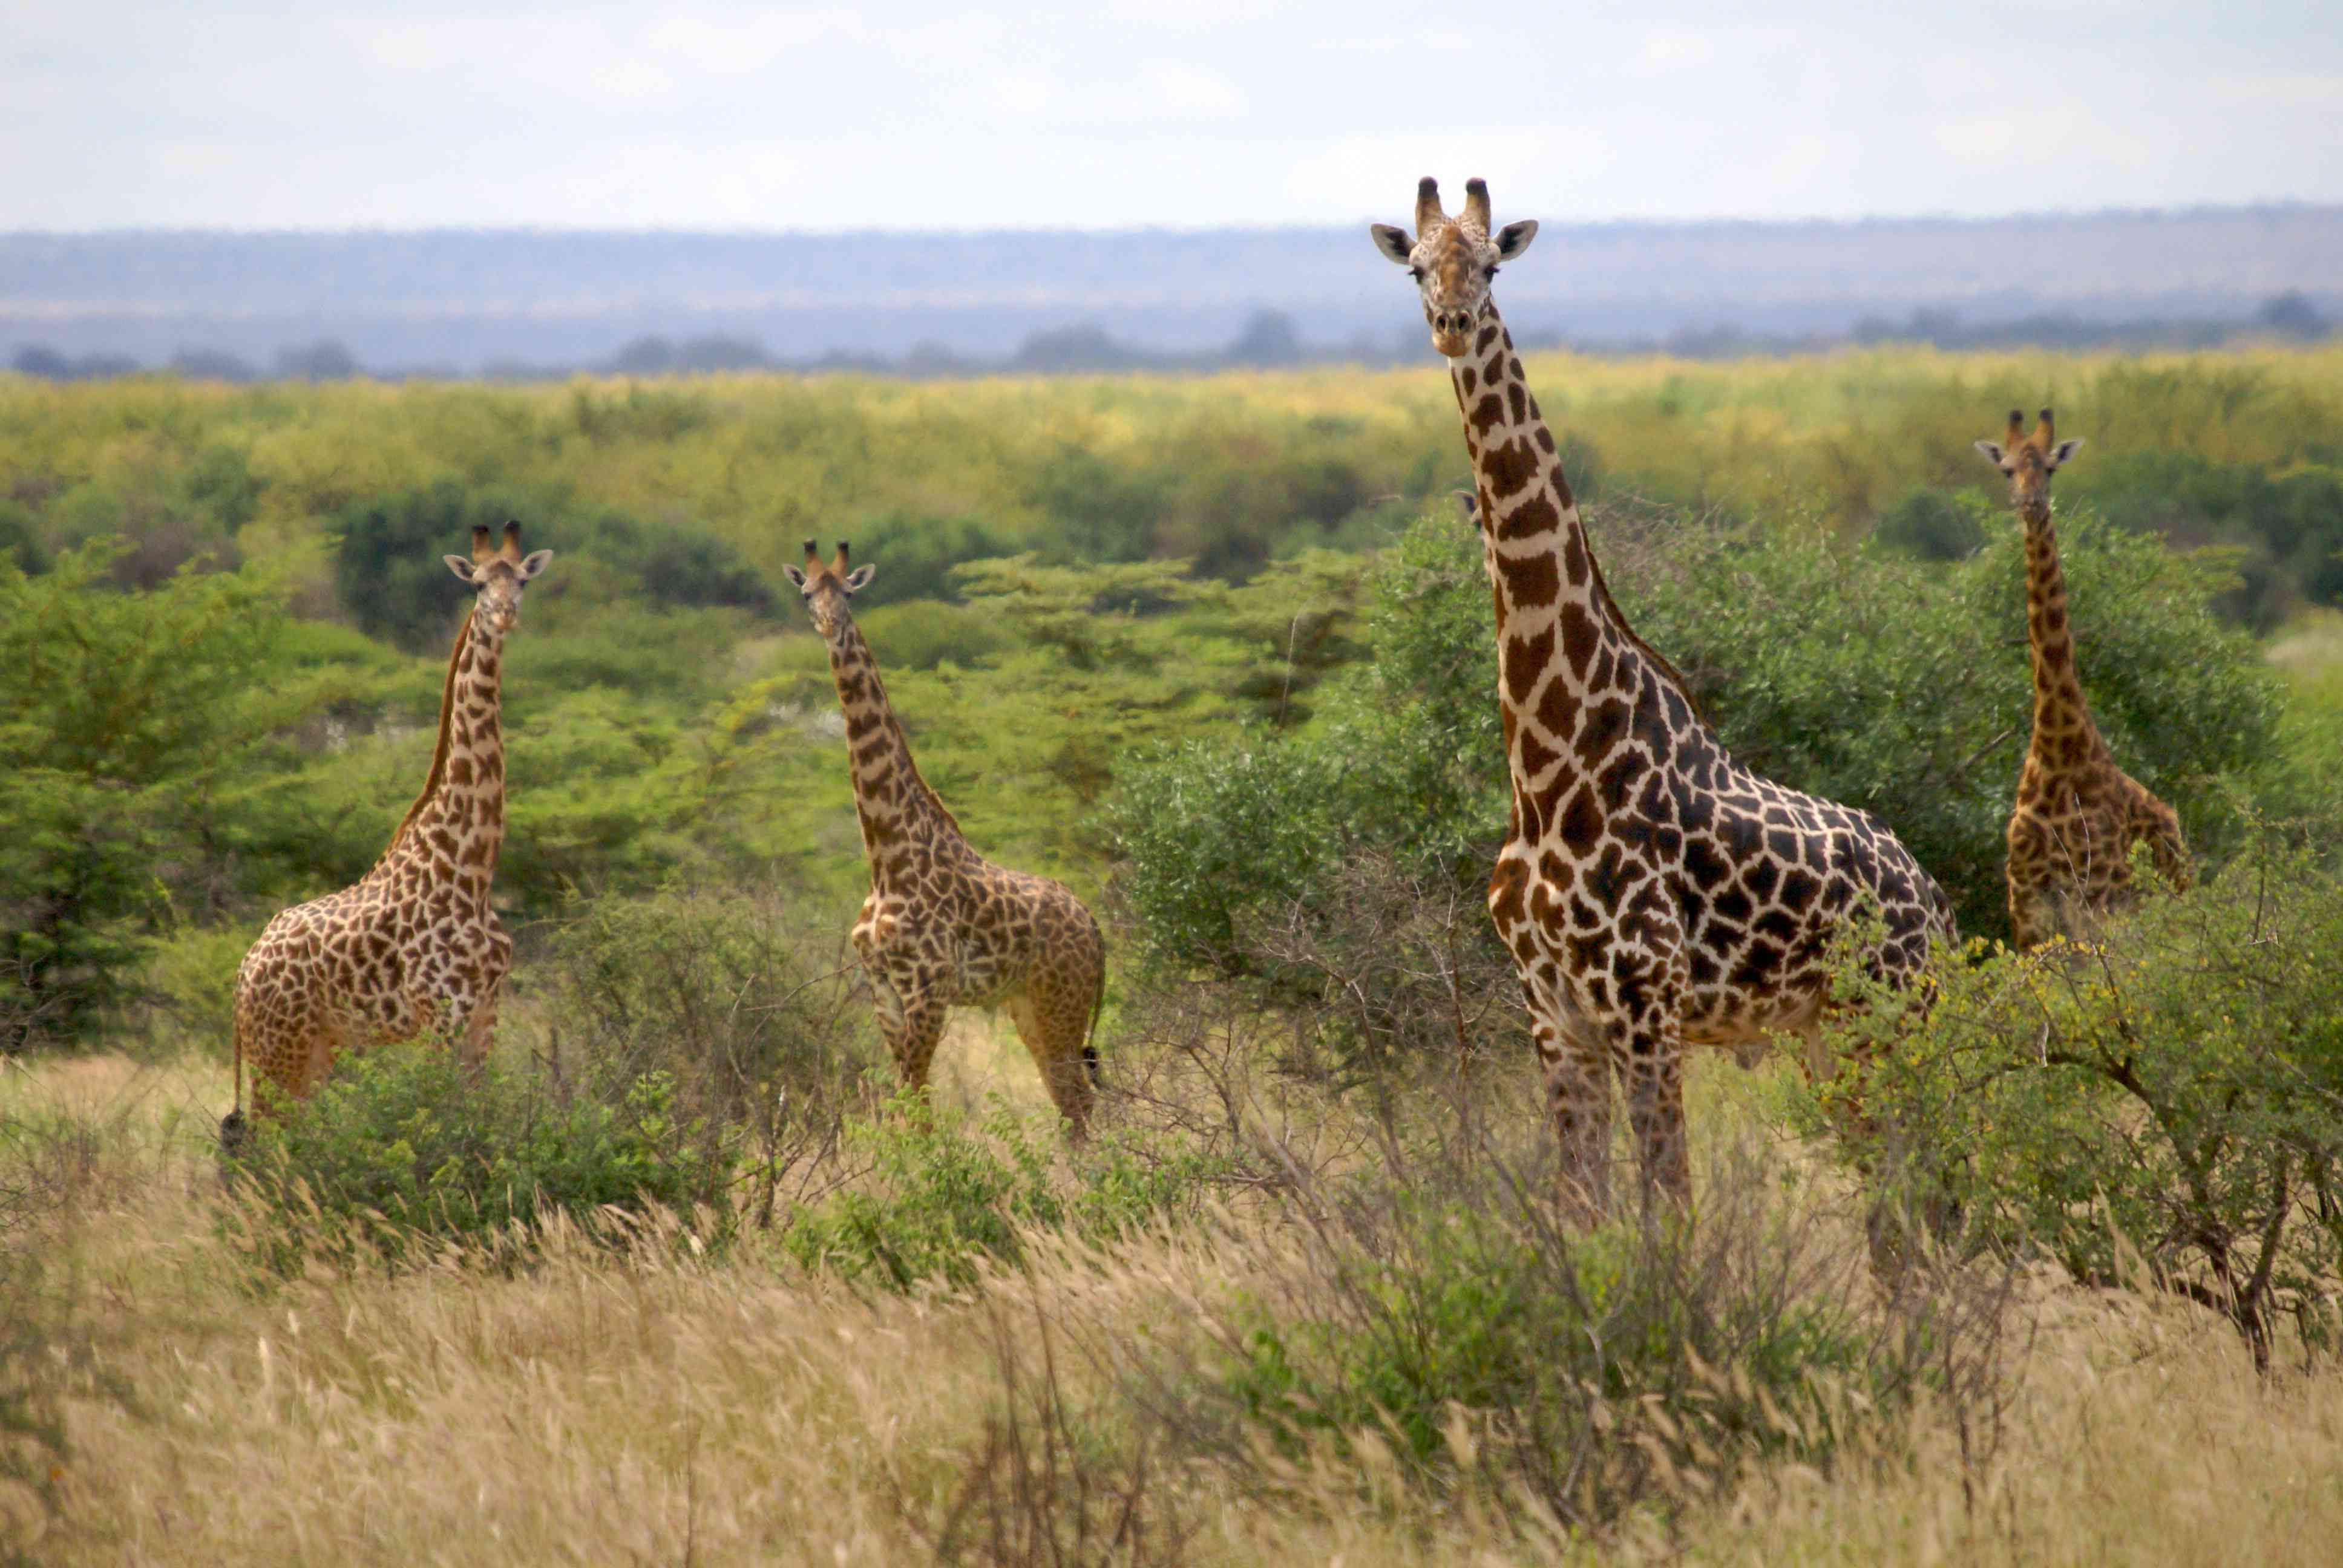 Group of giraffes in Tanzania's Mkomazi National Park